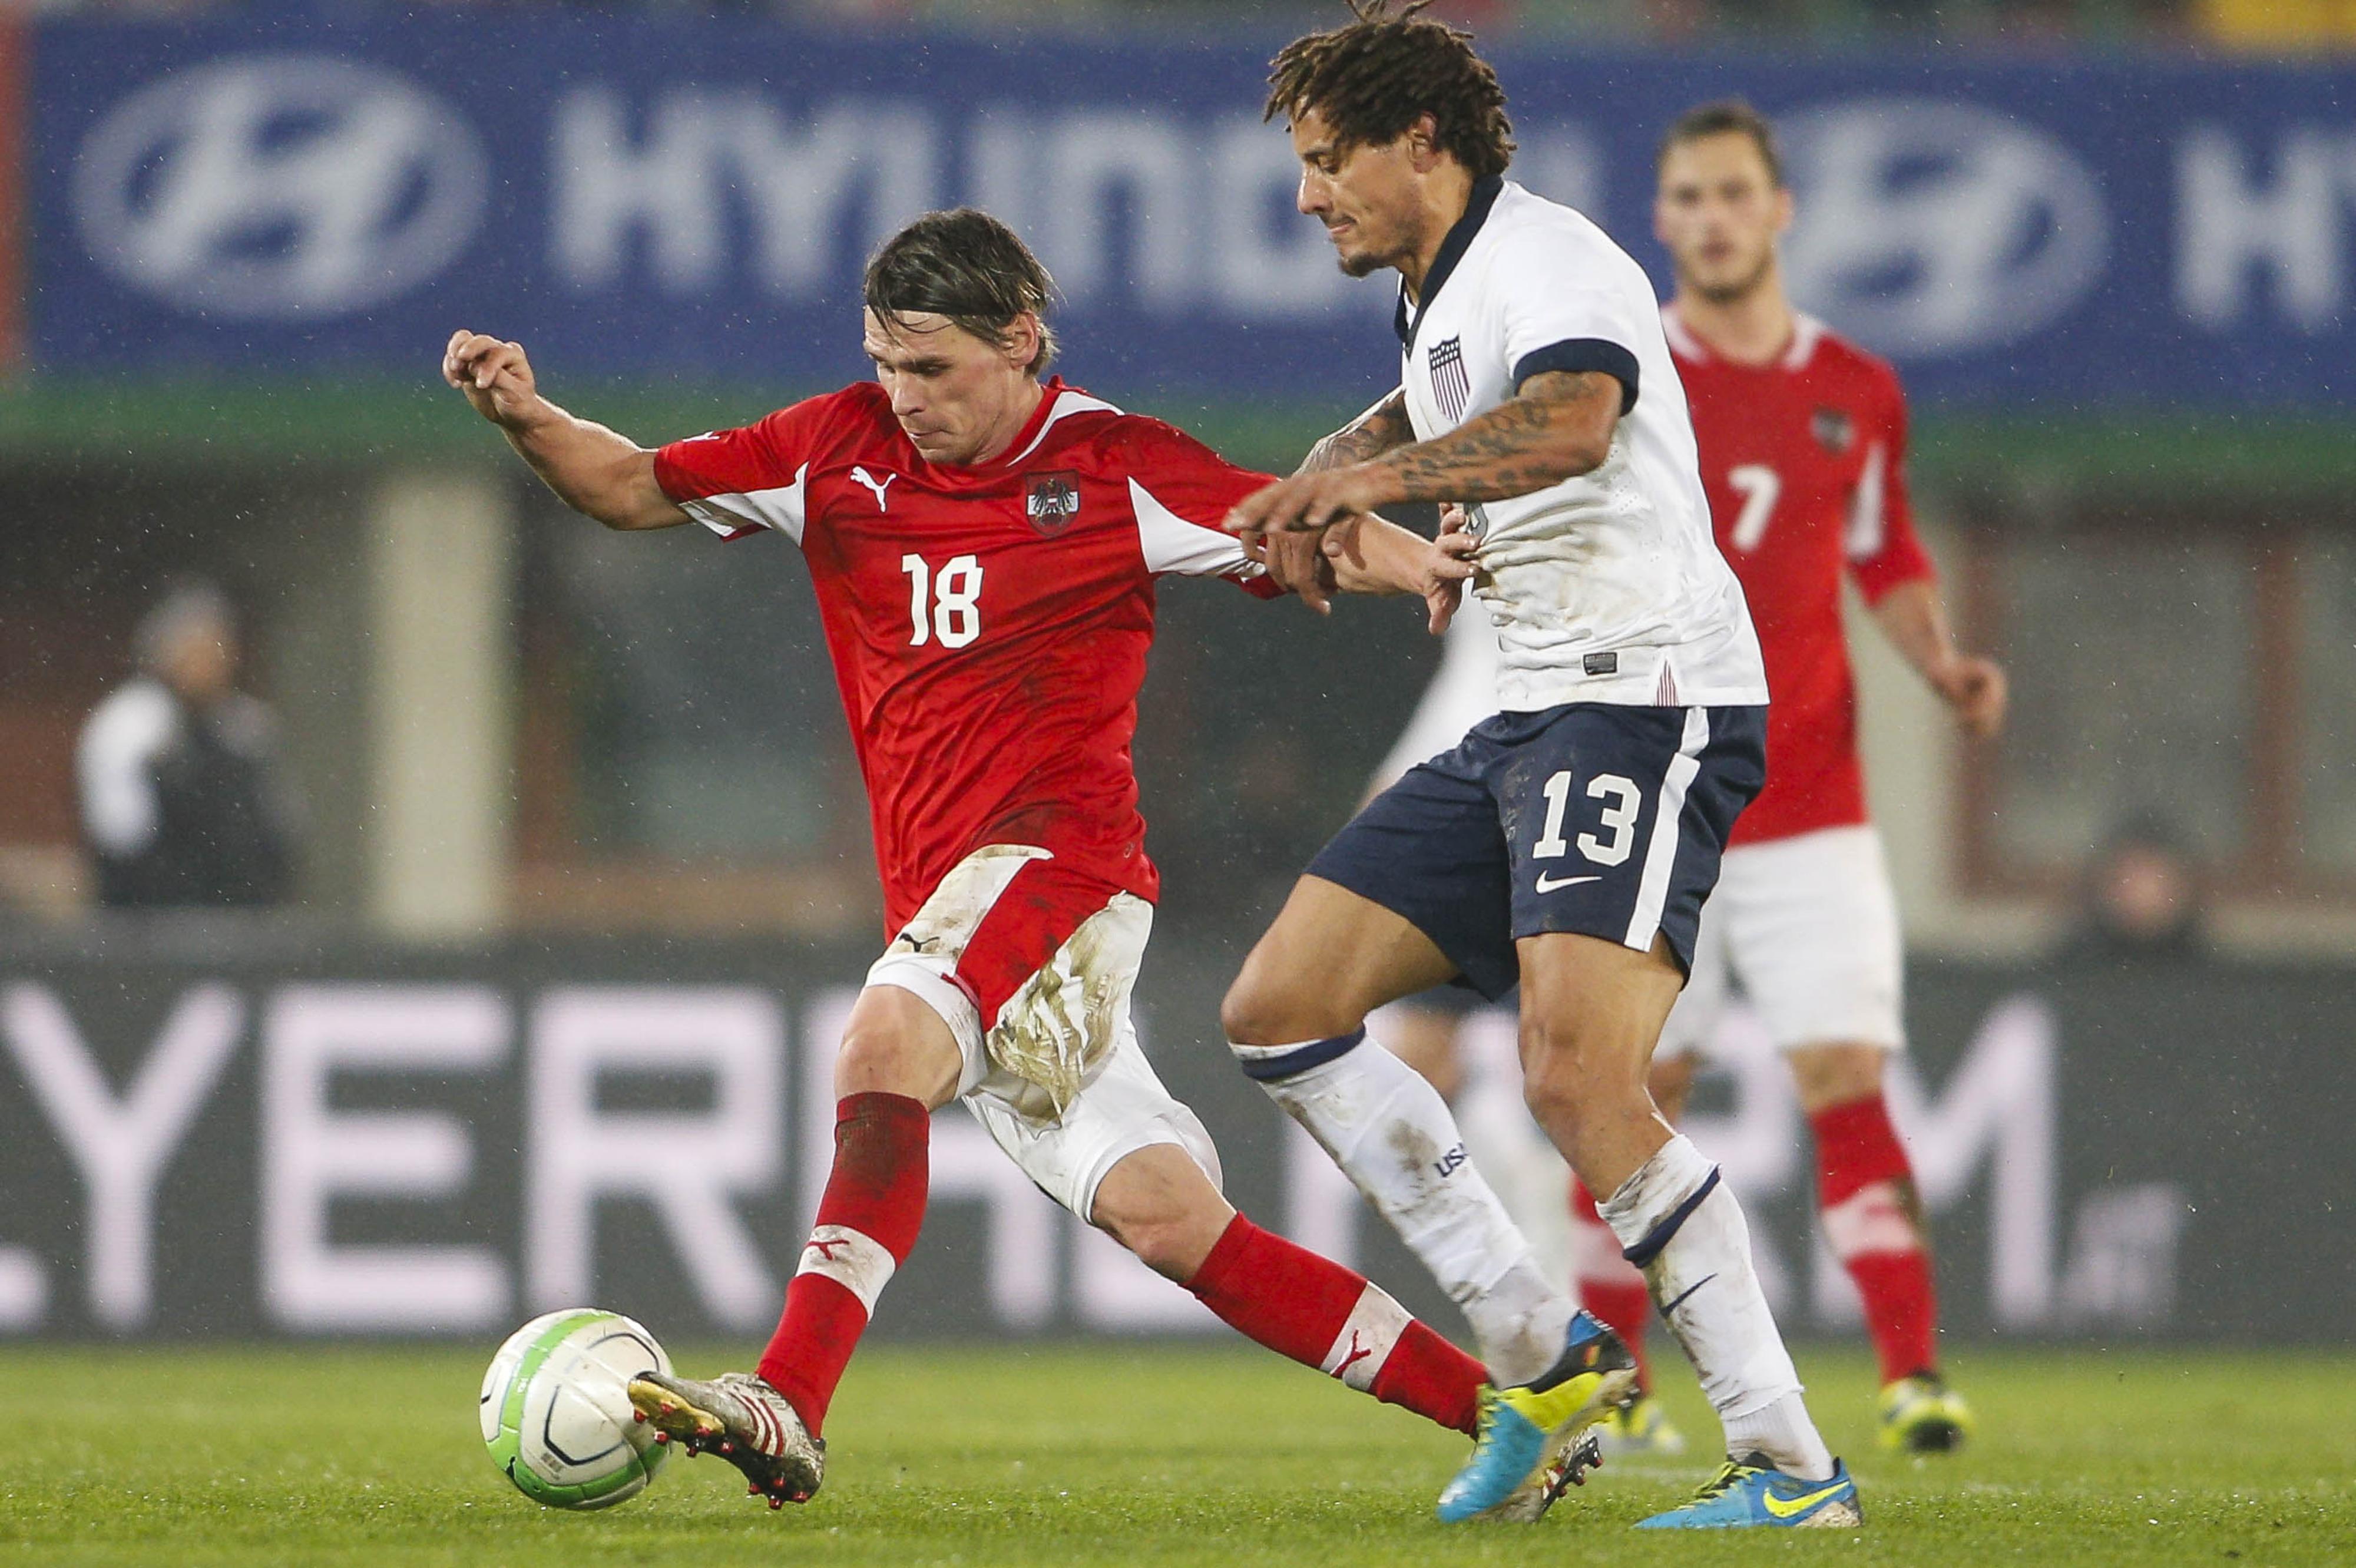 Austria vs. USA: Final score 1-0, Janko's goal downs the USMNT